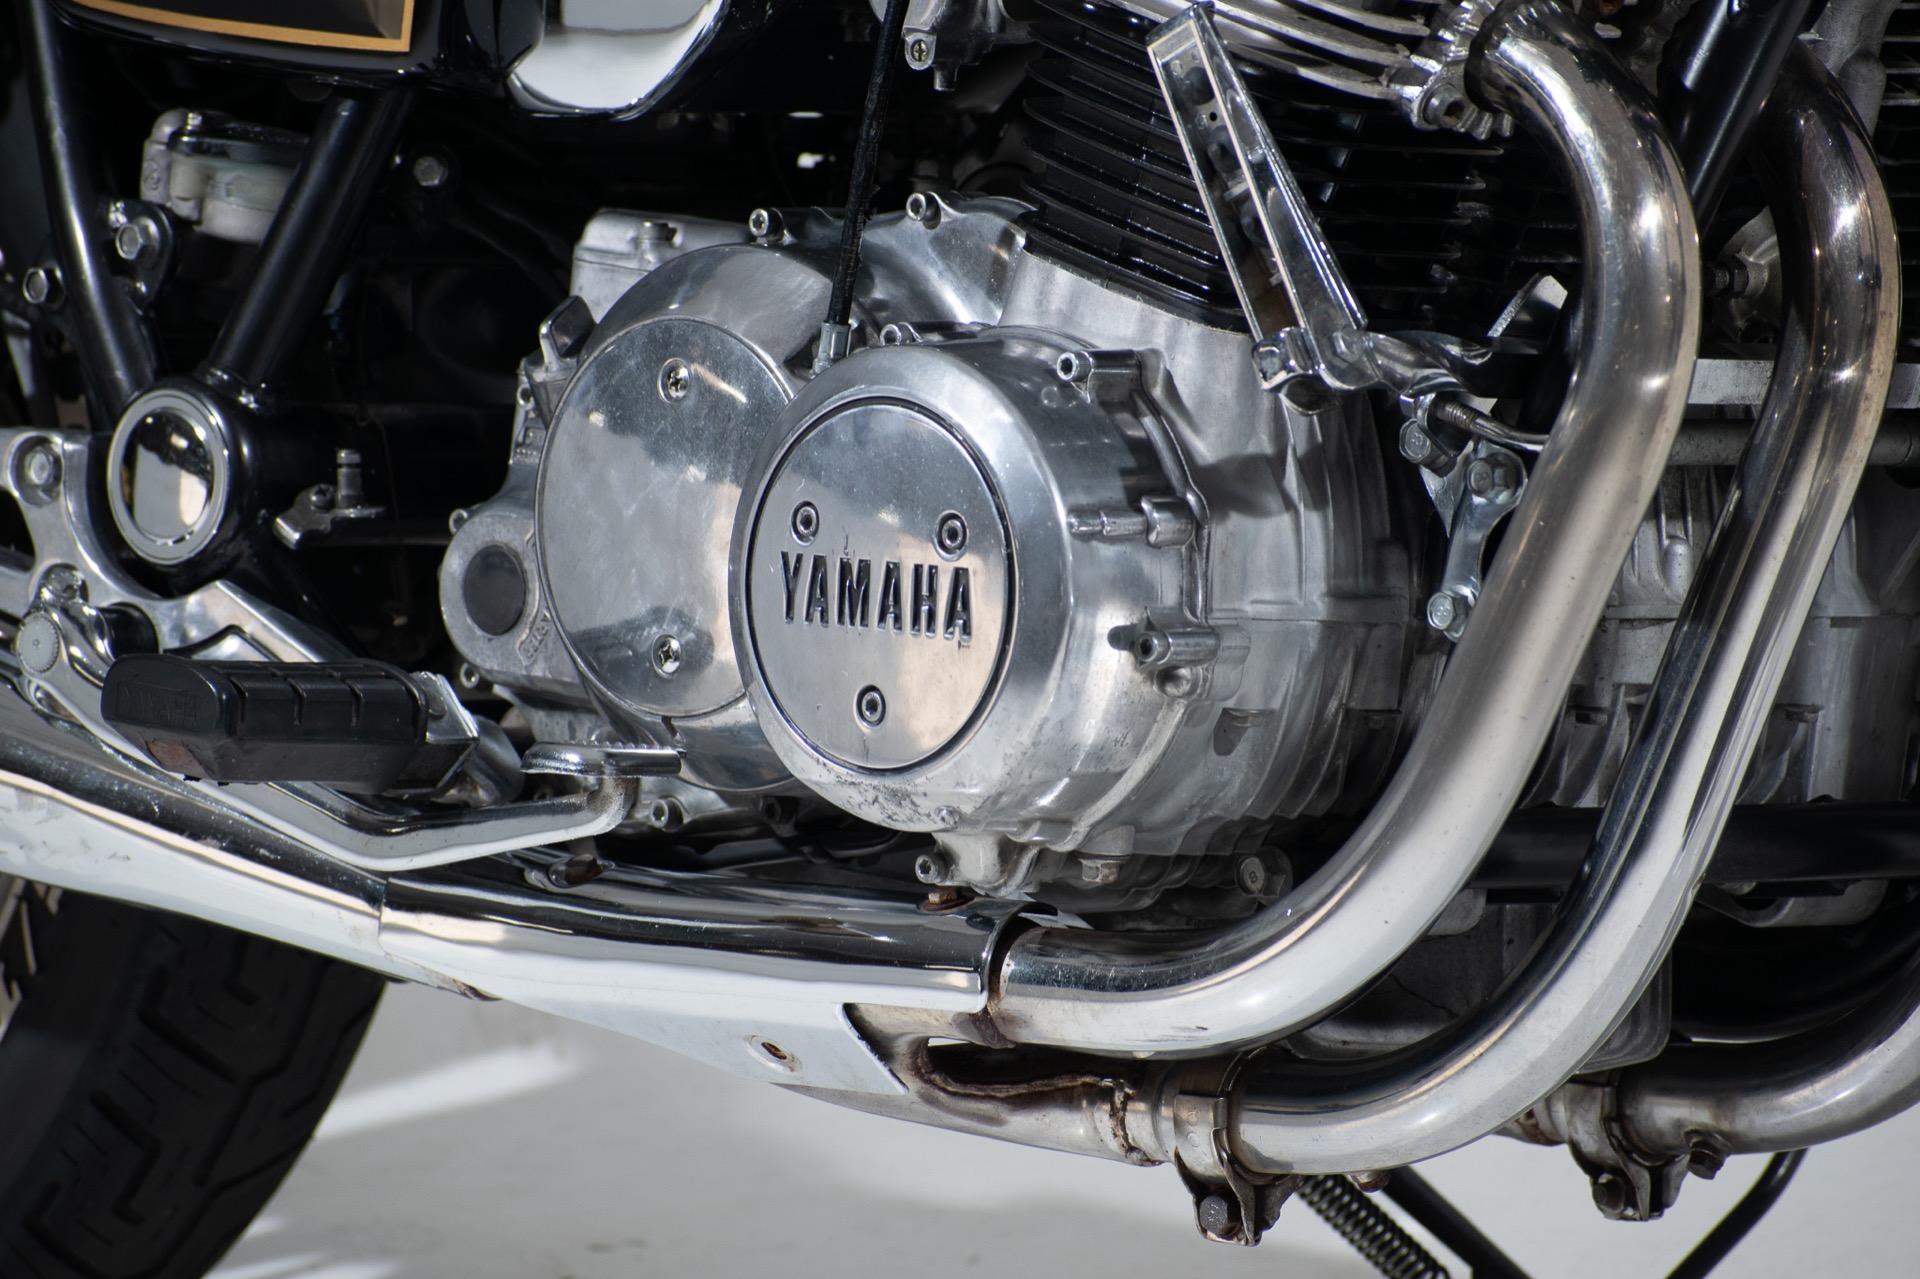 1981 Yamaha XS1100